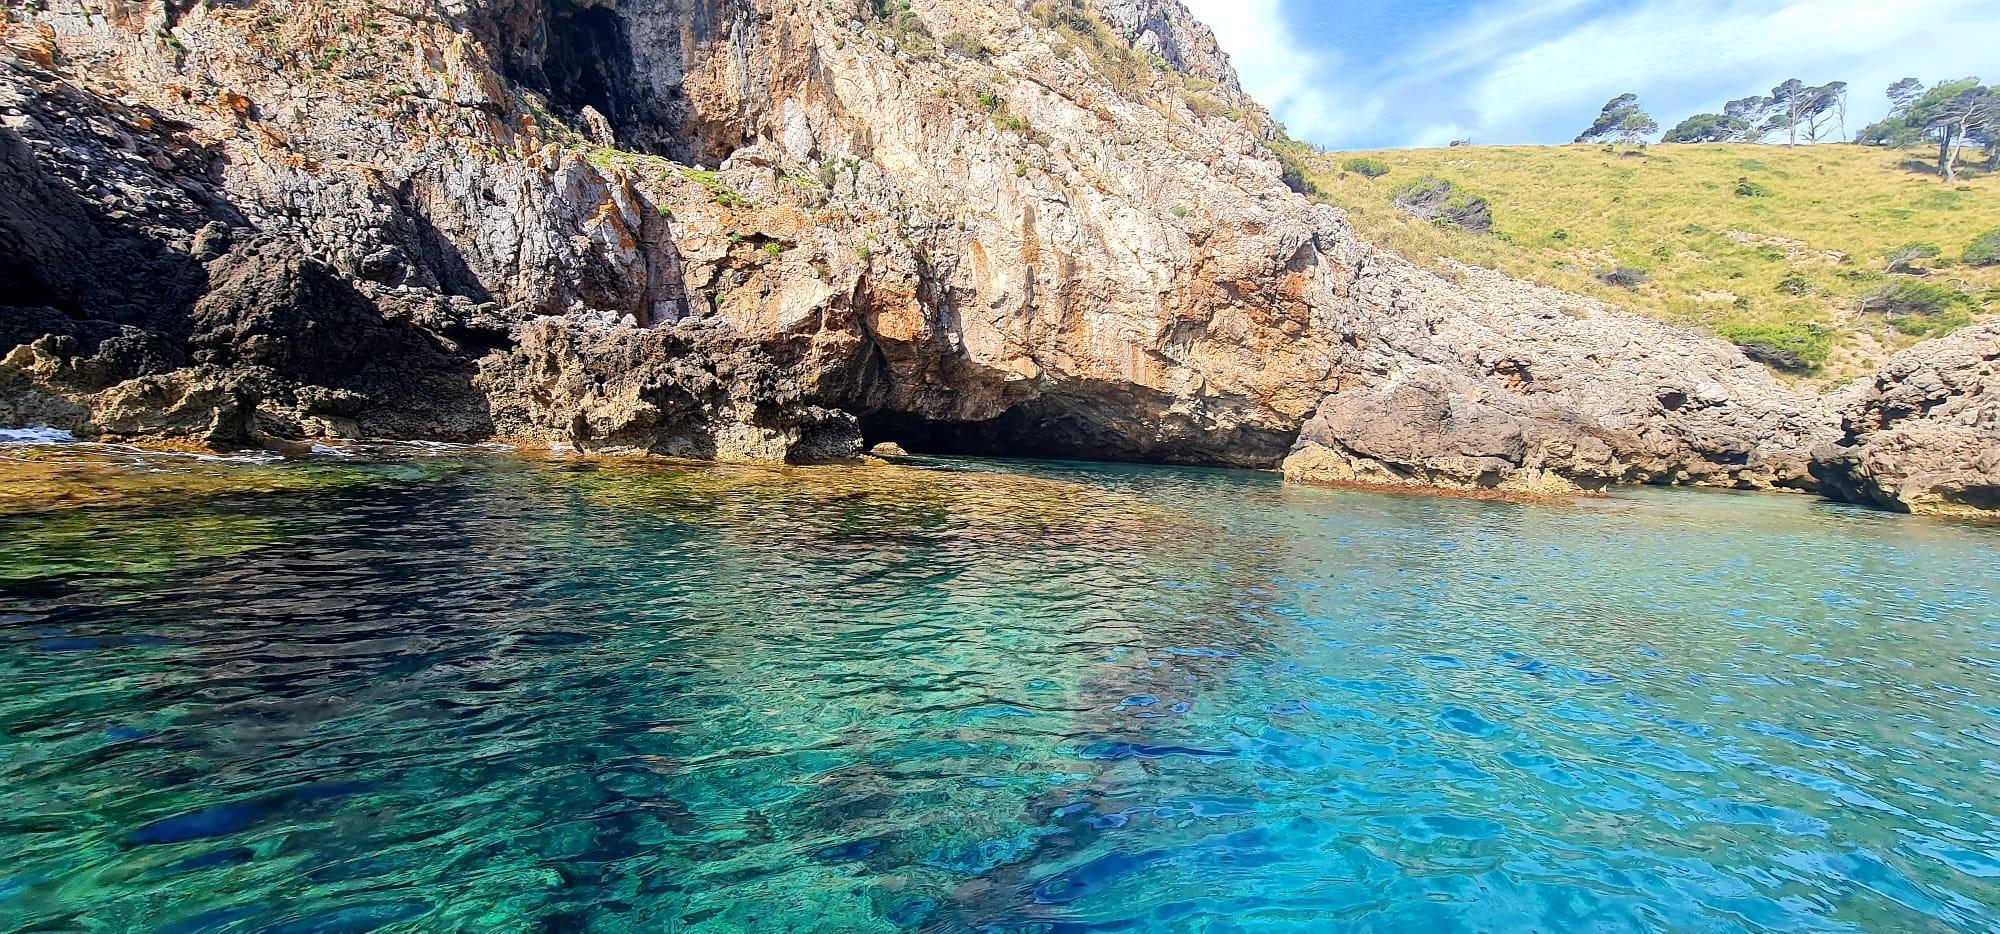 Jet Ski Safari to Jack Sparrow's Cave with Snorkeling